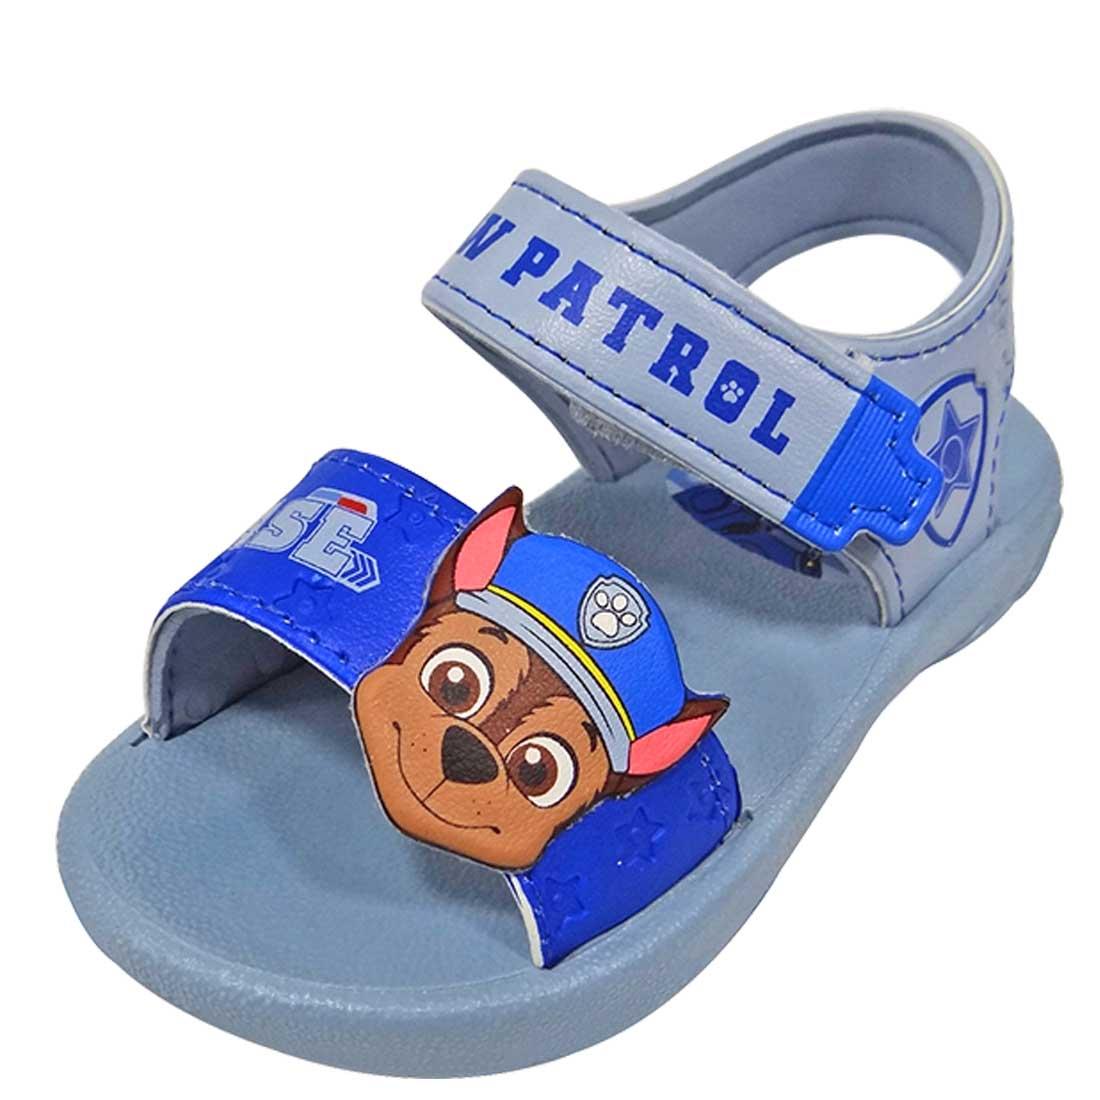 Sandália Baby Paw Patrol Chase - Cinza e Azul